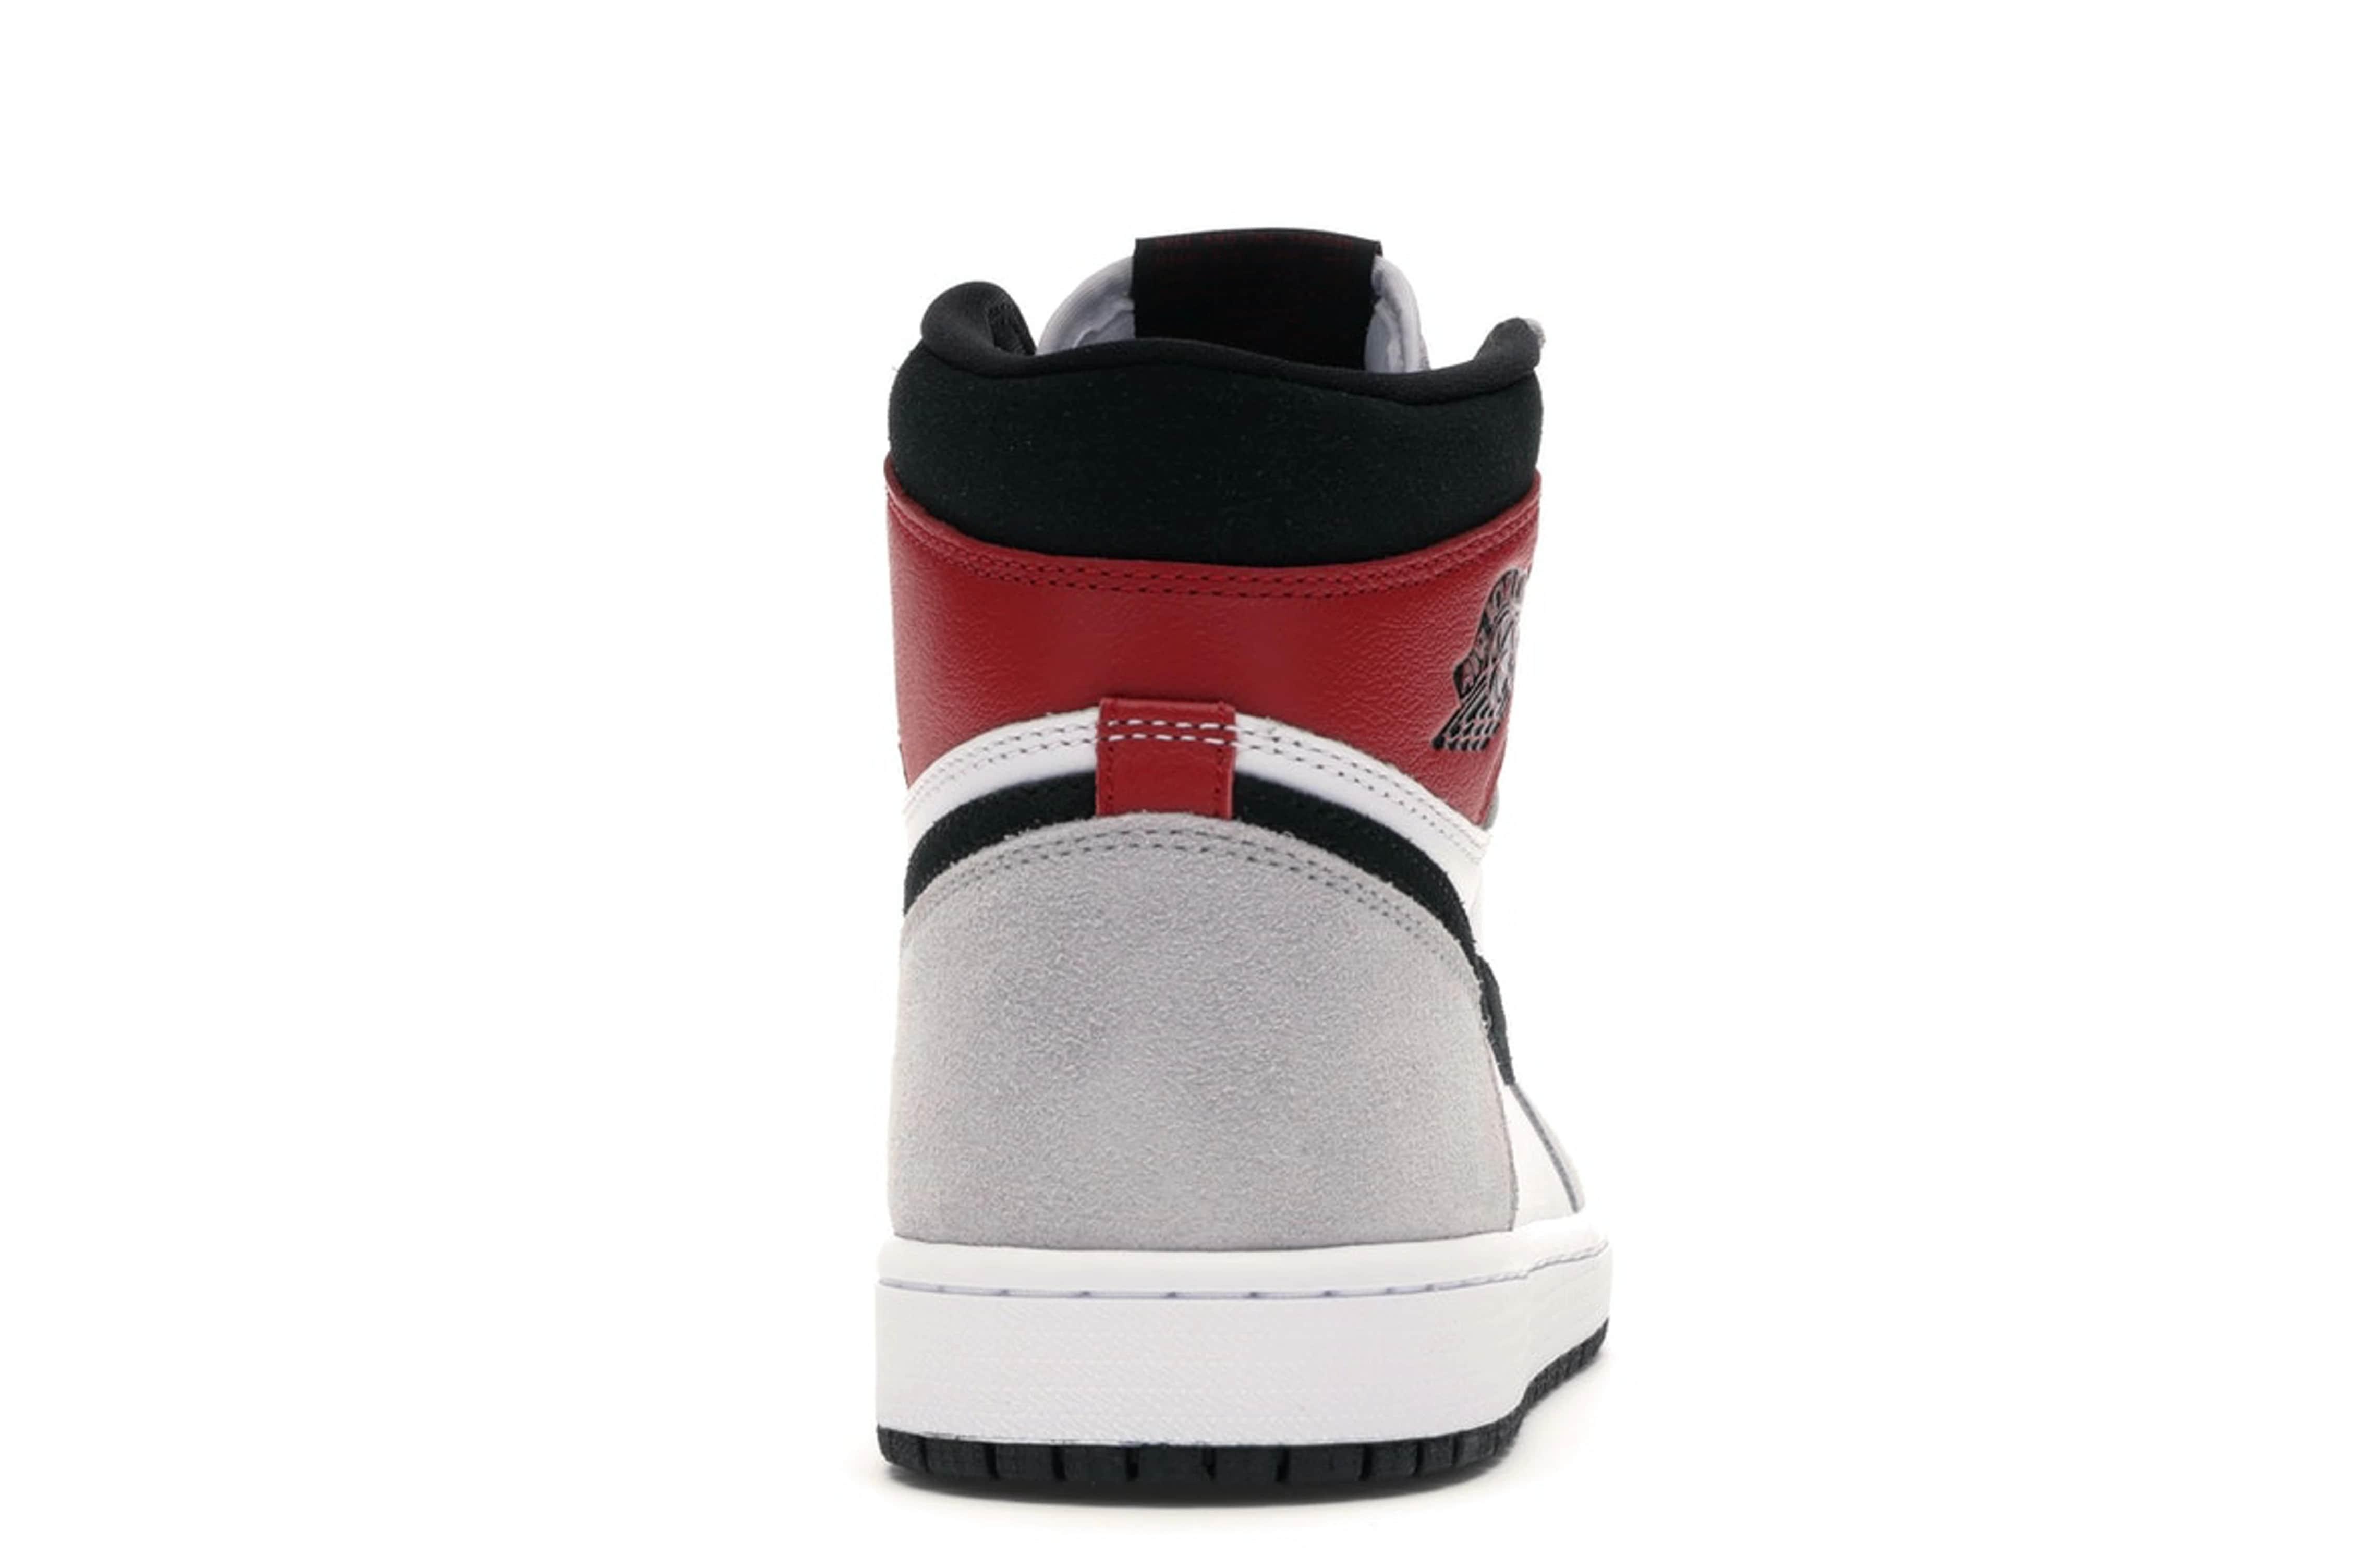 slide 4 - Jordan 1 Retro High Light Smoke Grey